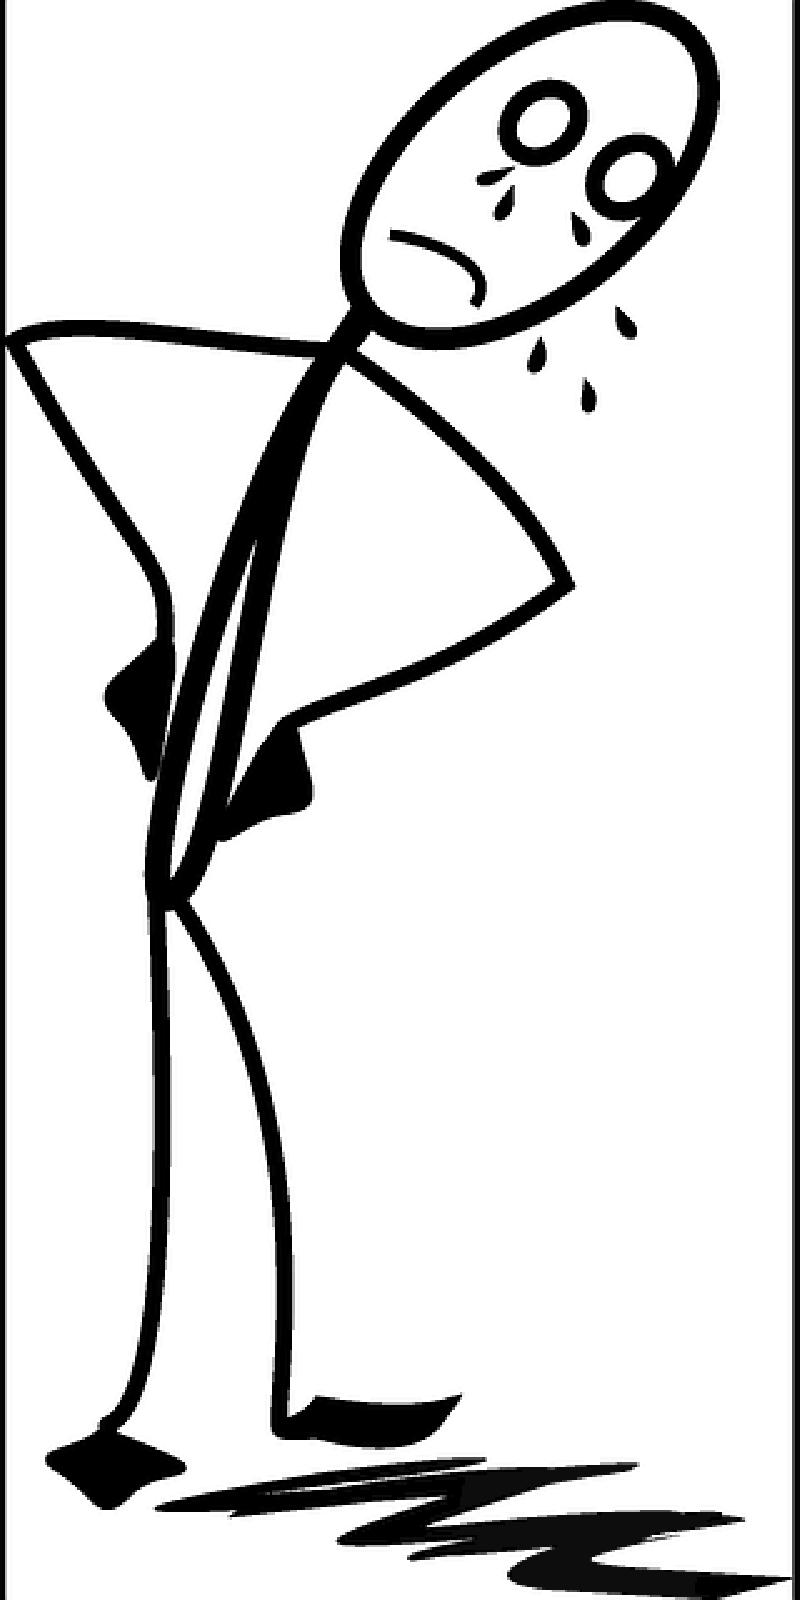 sad girl stick figure stickman cry man sad stick figure matchstick man sad girl stick figure clipart panda free clipart images